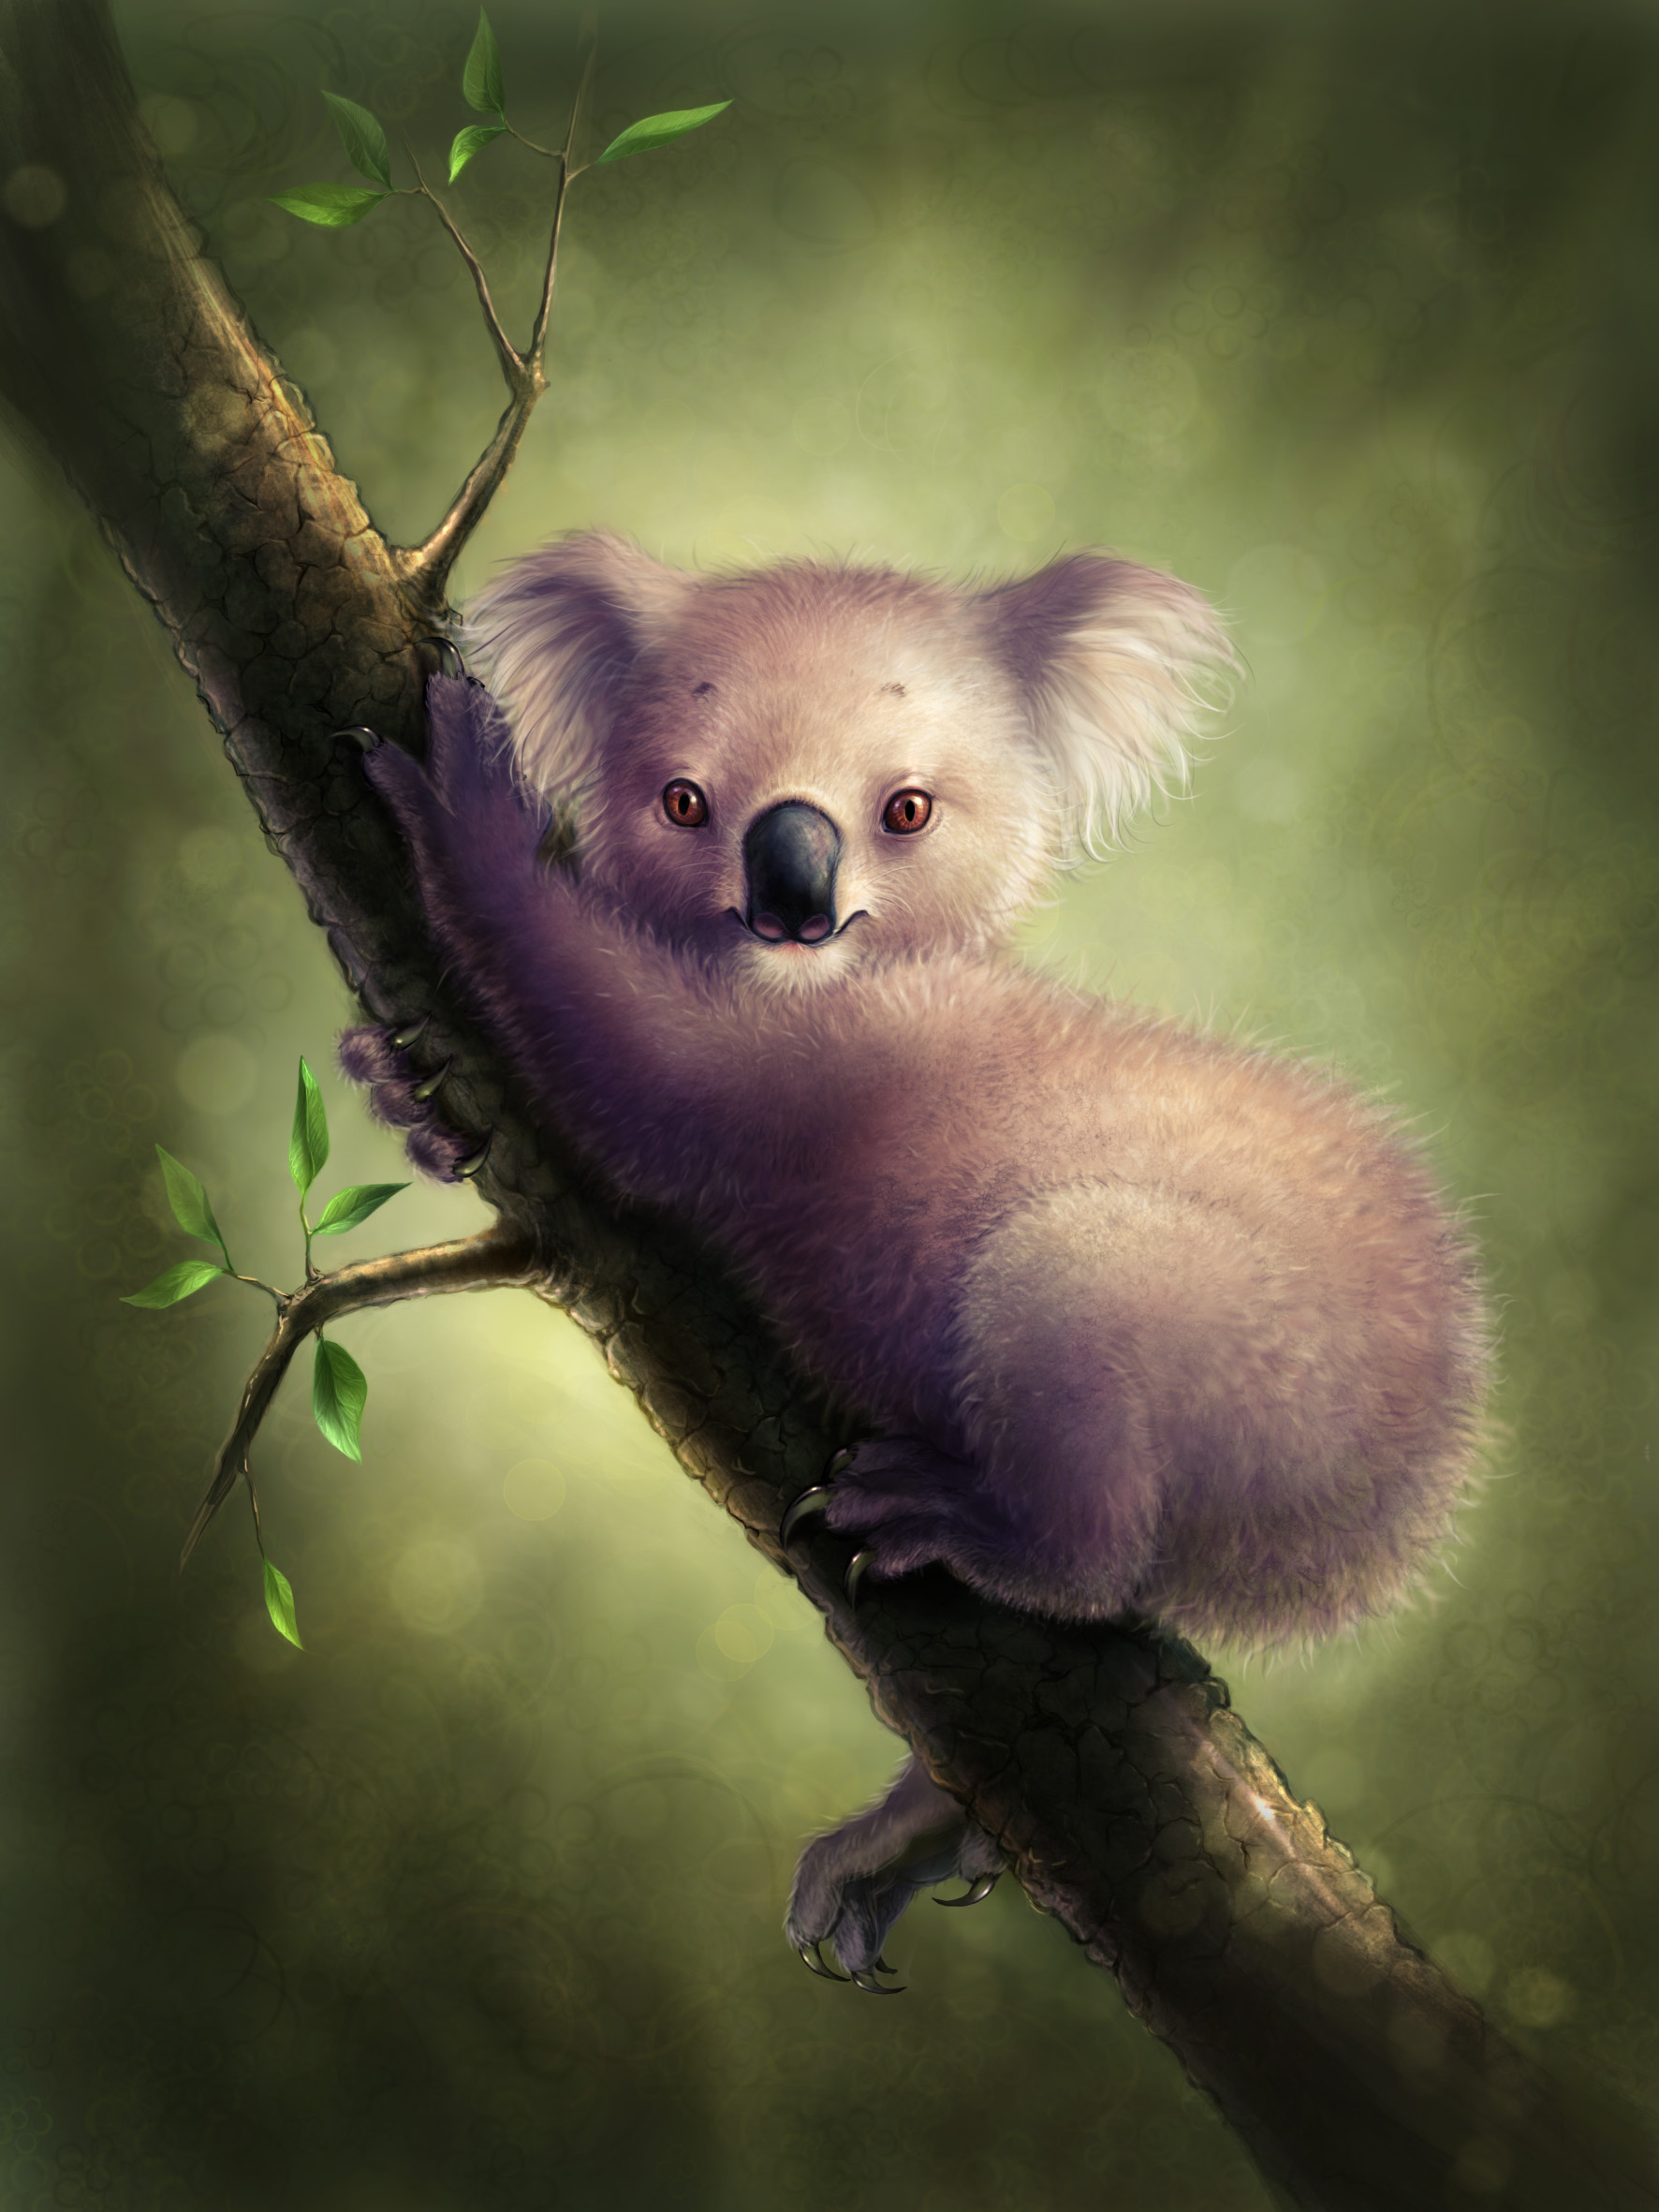 Spherical koala in vacuum by OlesyaGavr